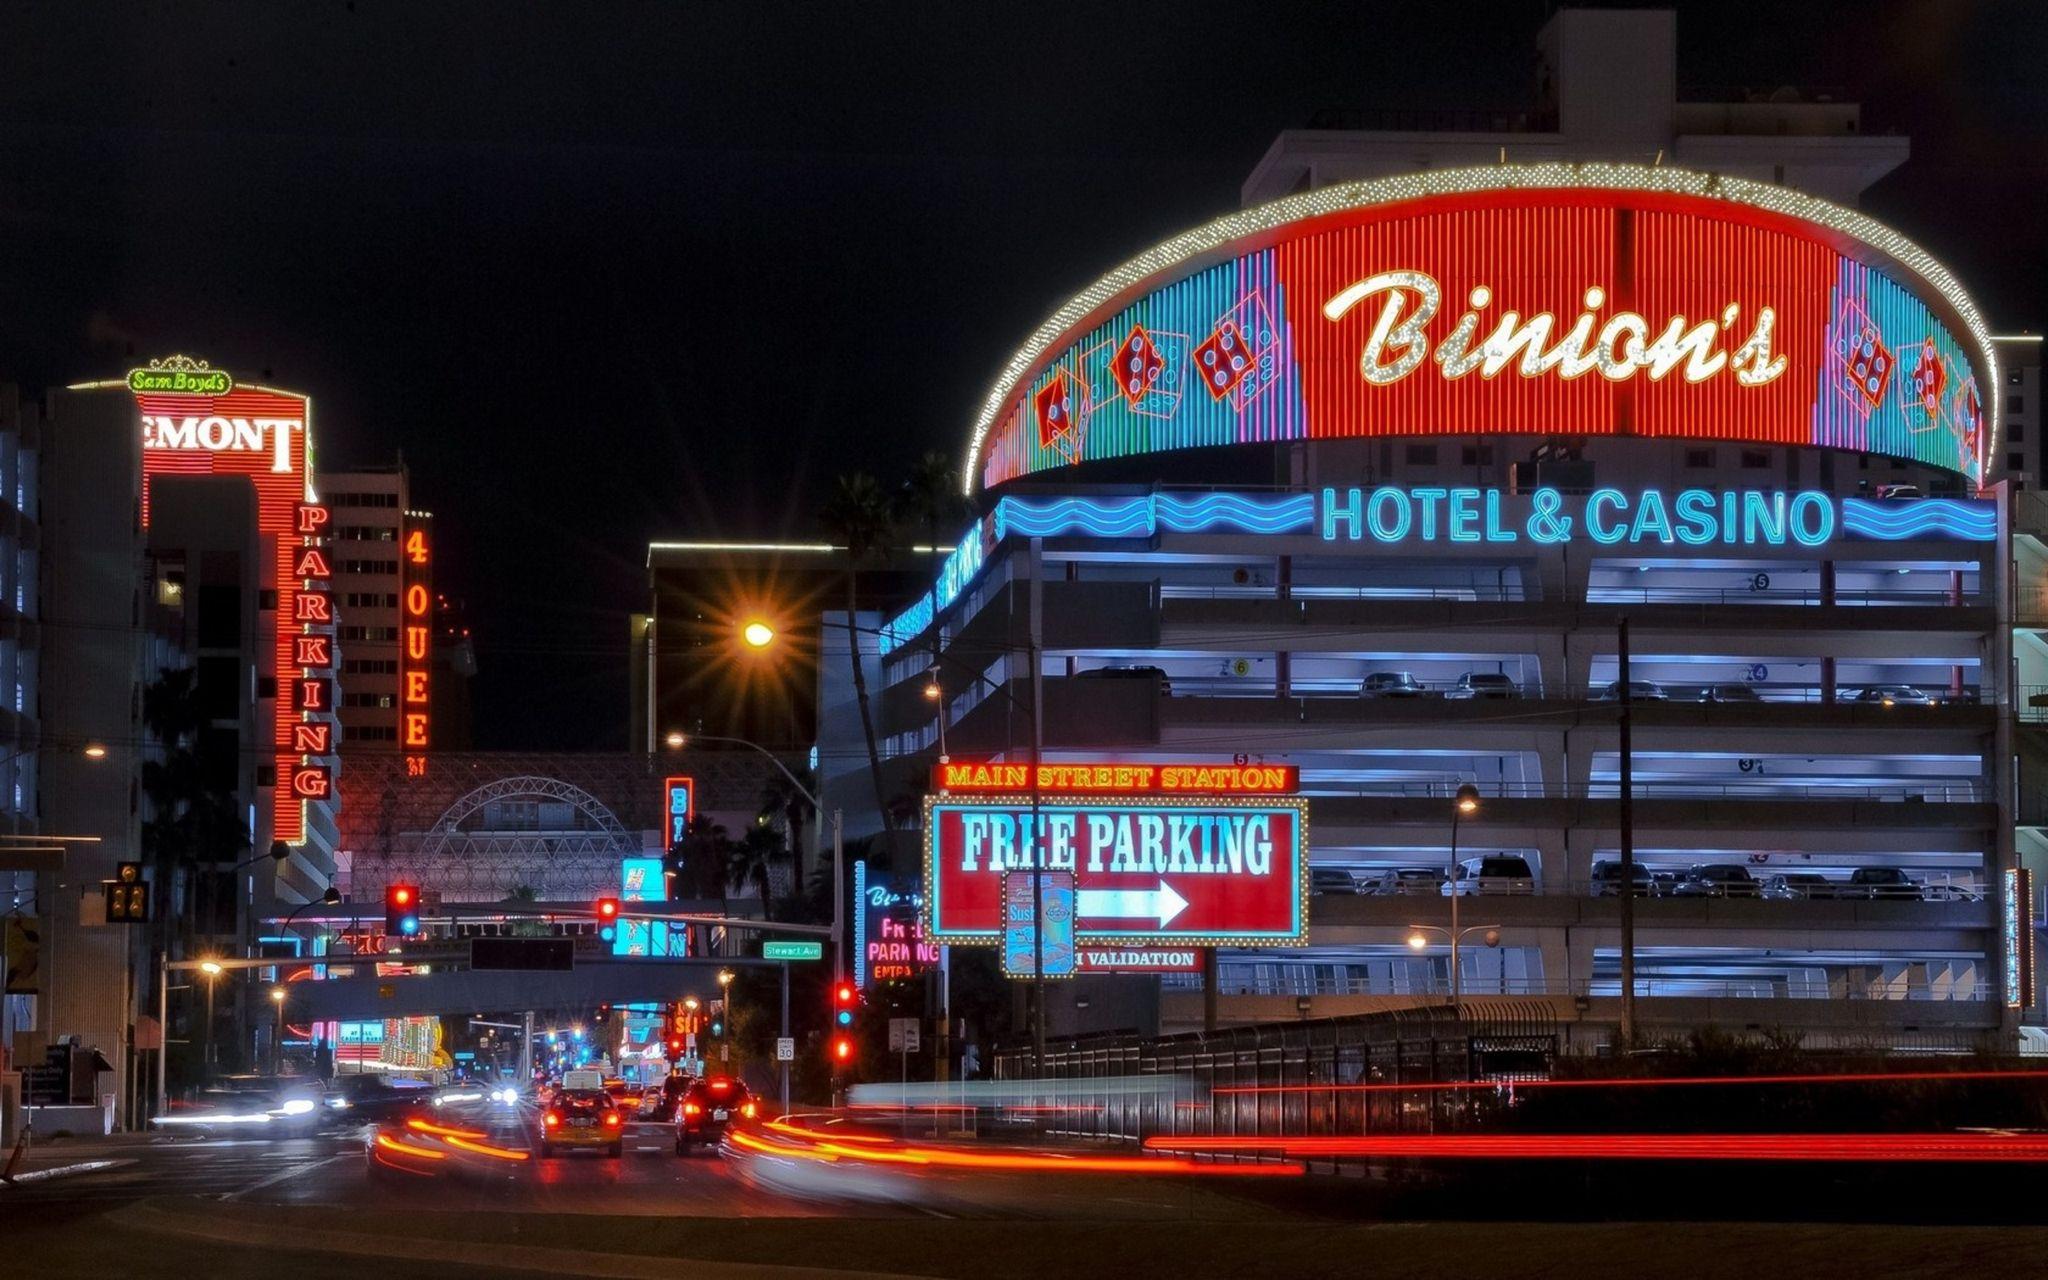 Binions casino parking horseshoe casino hotel cleveland